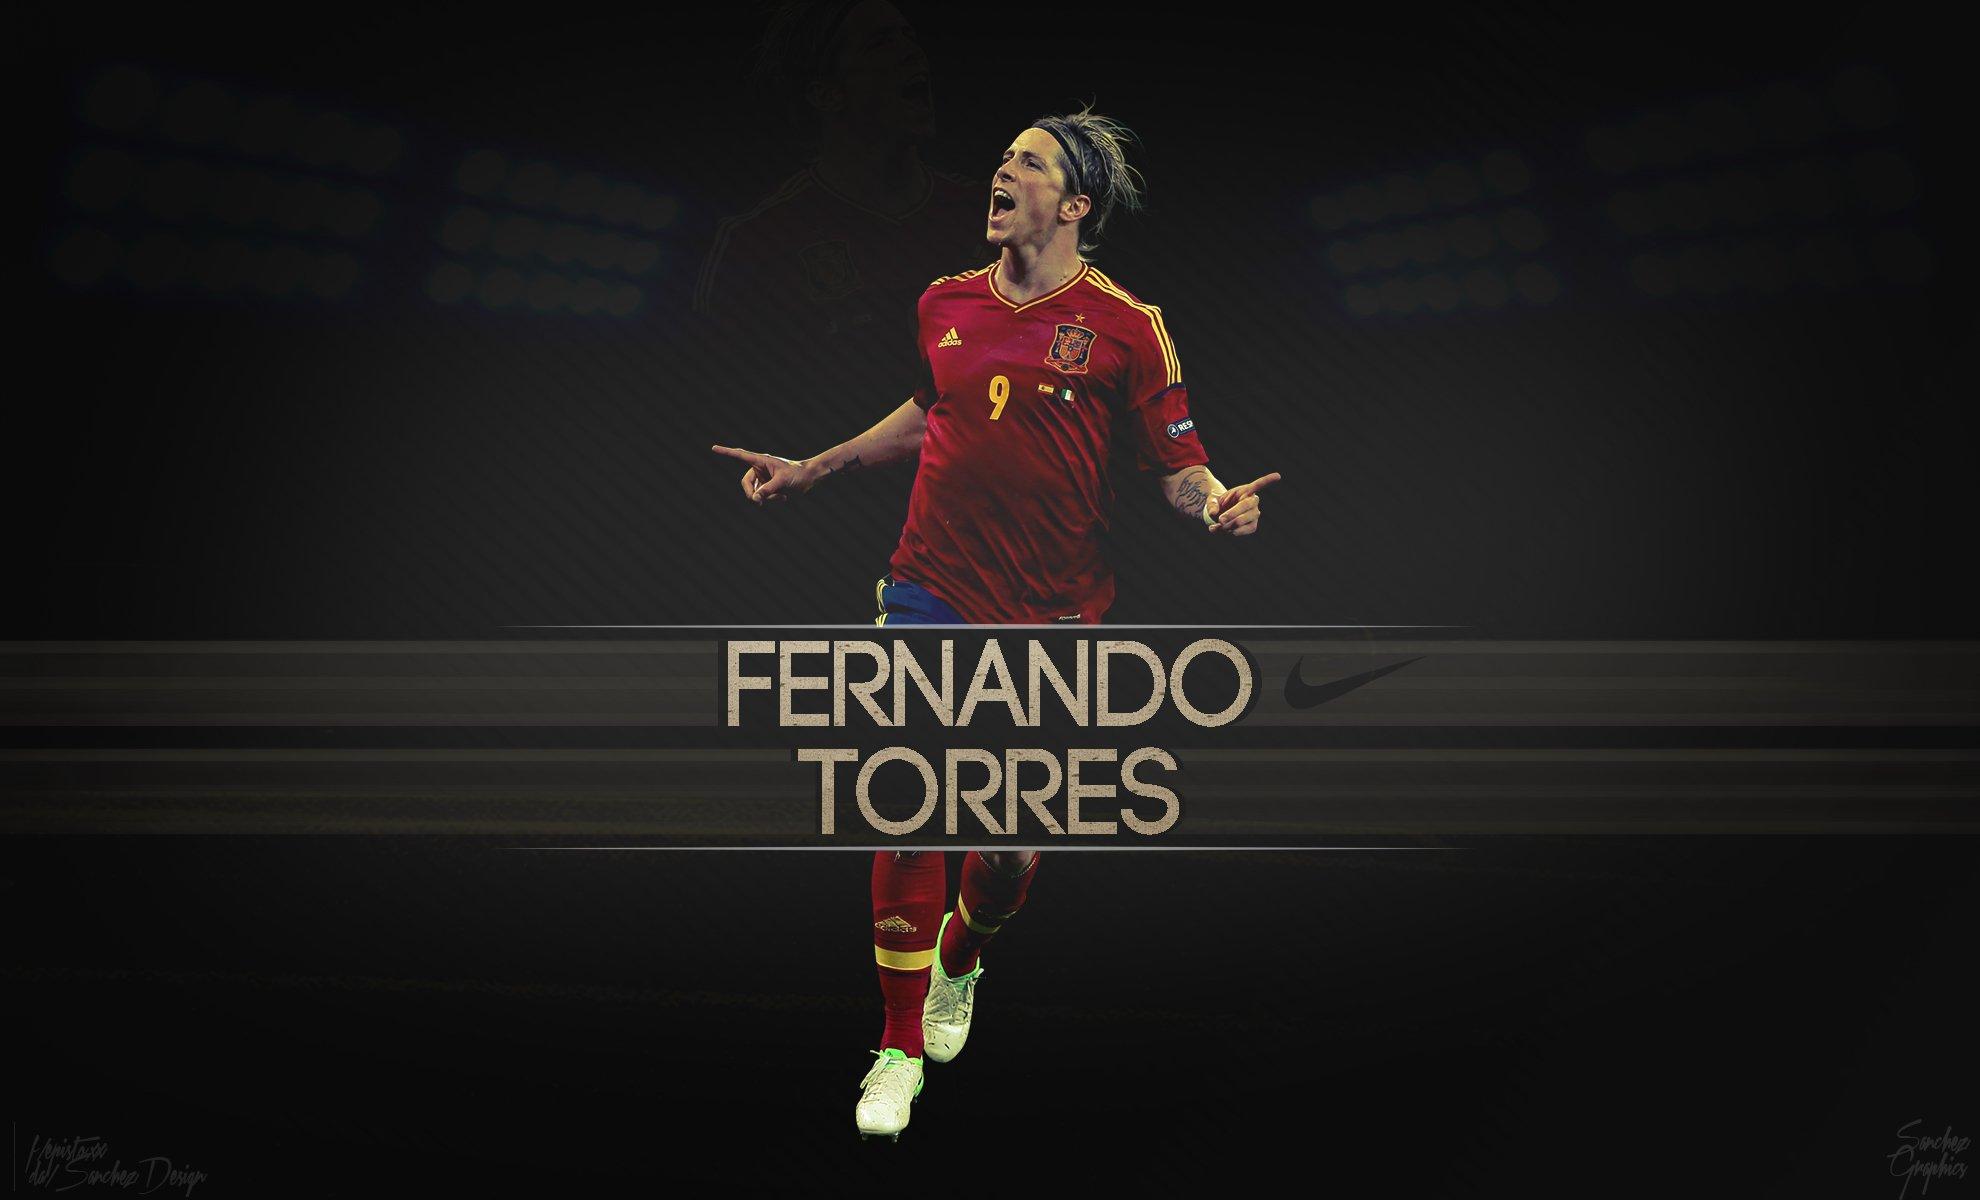 http://s5.picofile.com/file/8125217376/Fernando_Torres_Wallpaper_1_.jpg